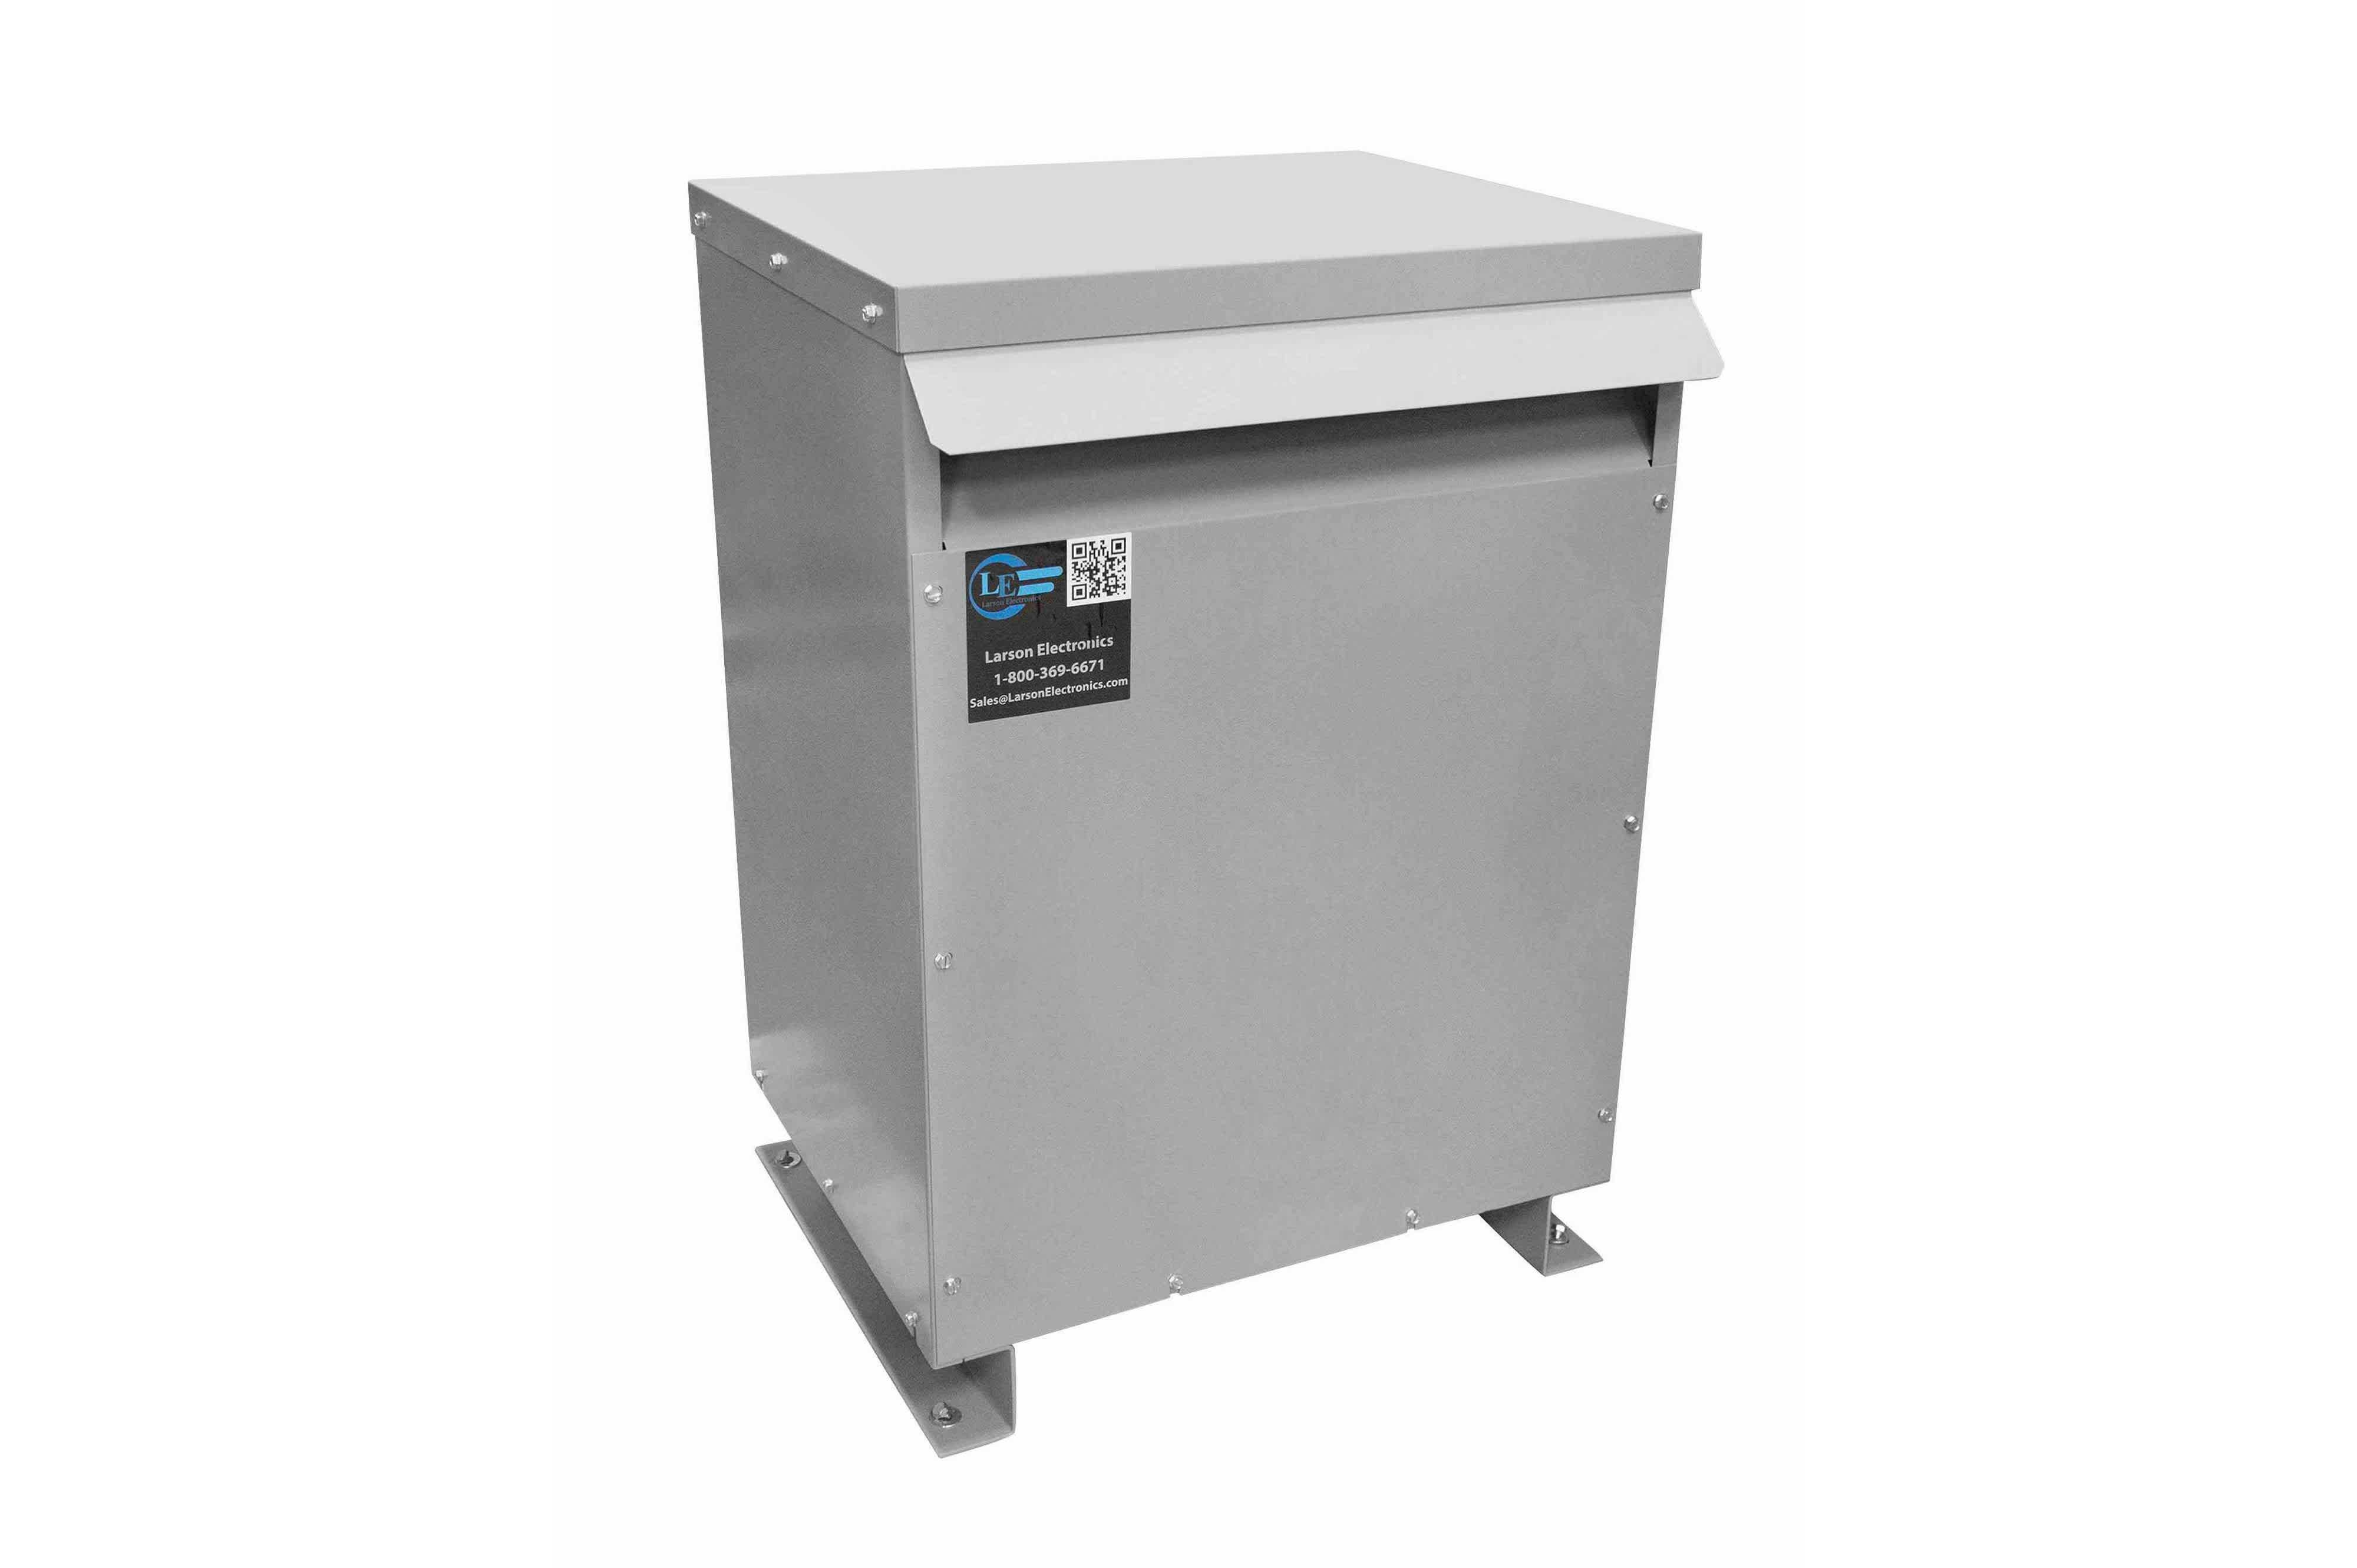 70 kVA 3PH Isolation Transformer, 400V Wye Primary, 208V Delta Secondary, N3R, Ventilated, 60 Hz